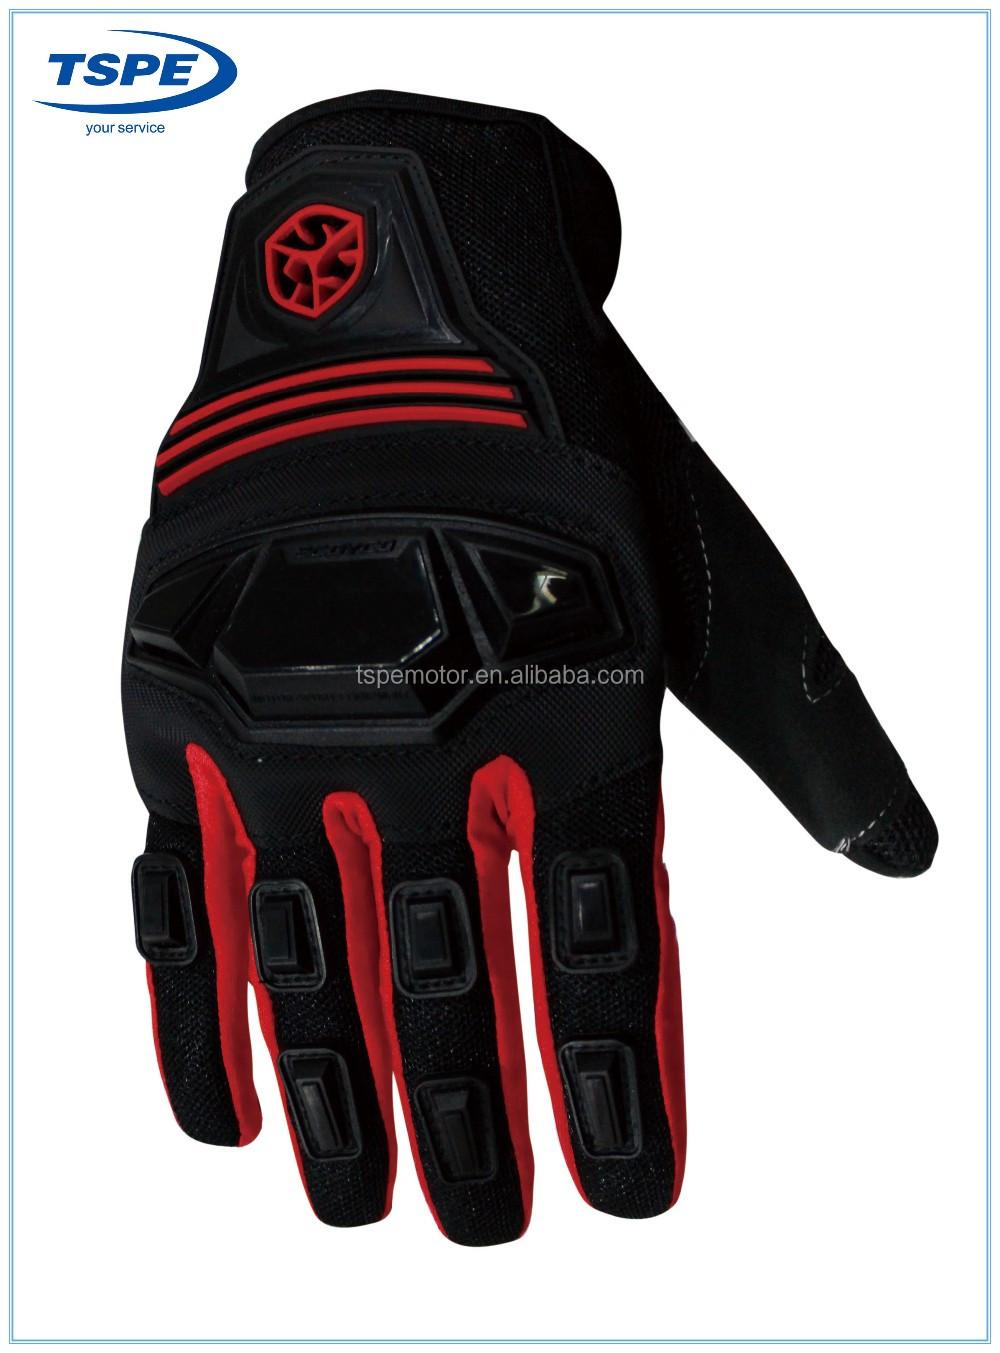 Motorcycle gloves distributor - Motorcycle Gloves Motorcycle Gloves Suppliers And Manufacturers At Alibaba Com